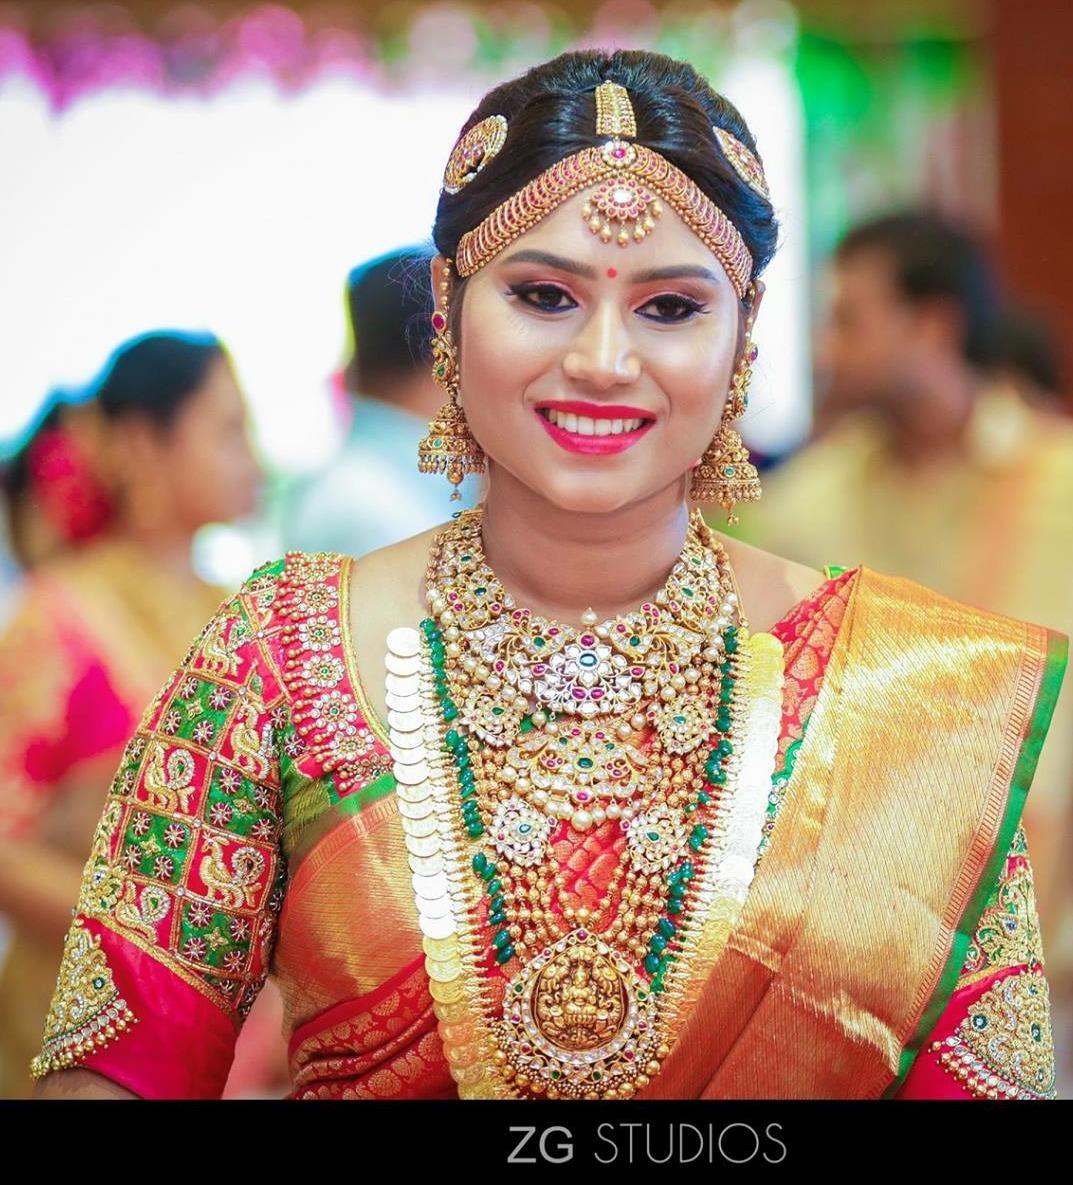 Indian Bride: South Indian Bride In Kundan Wedding Jewellery